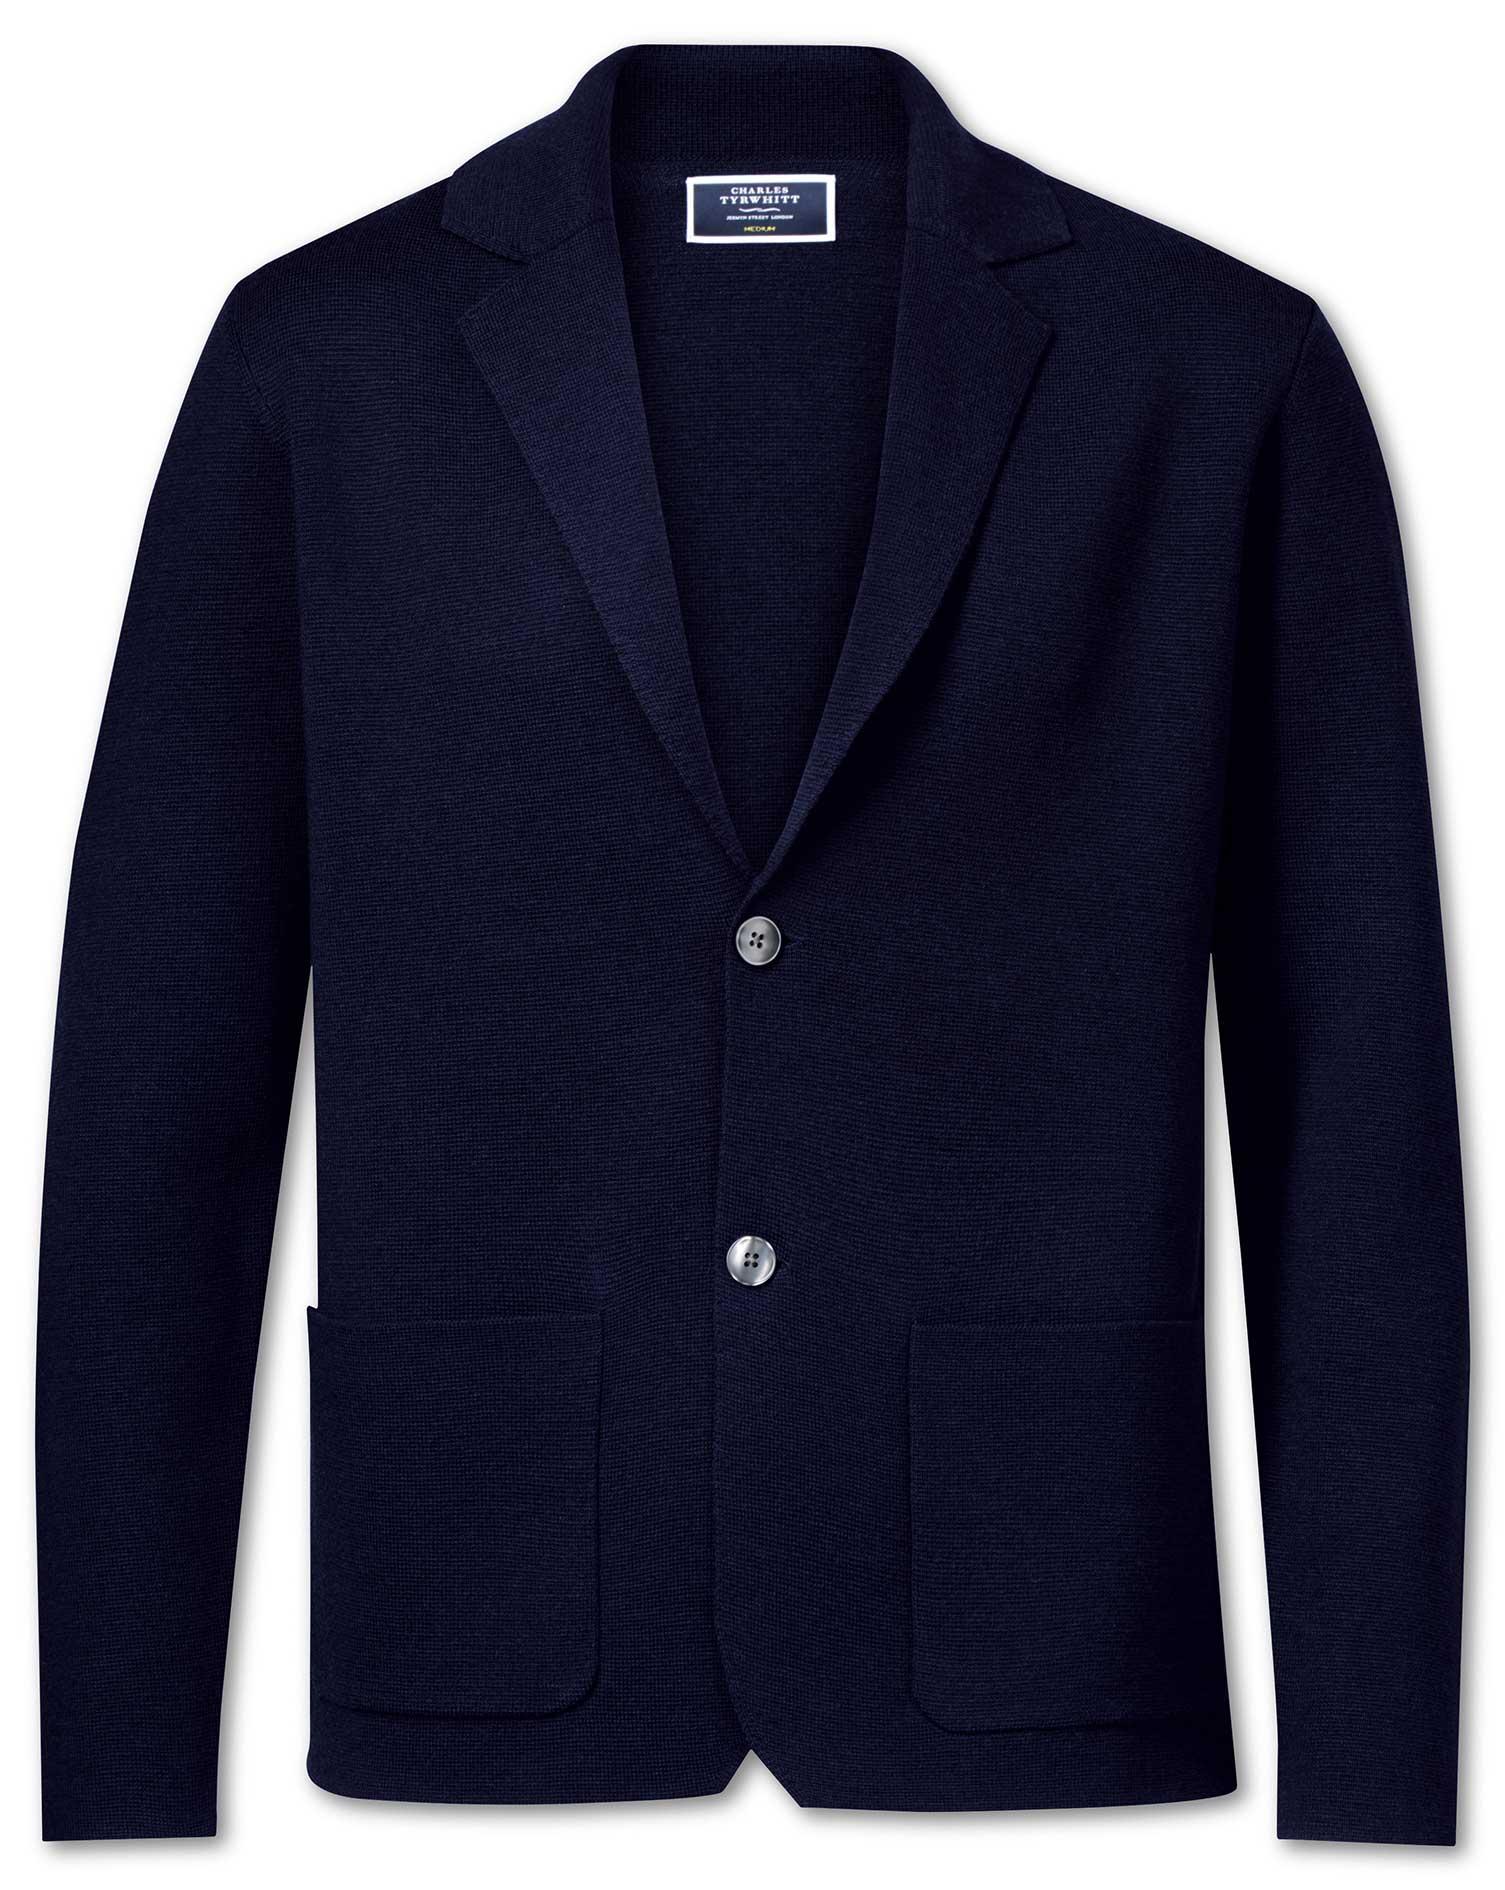 Navy Merino Wool Blazer Size Large by Charles Tyrwhitt